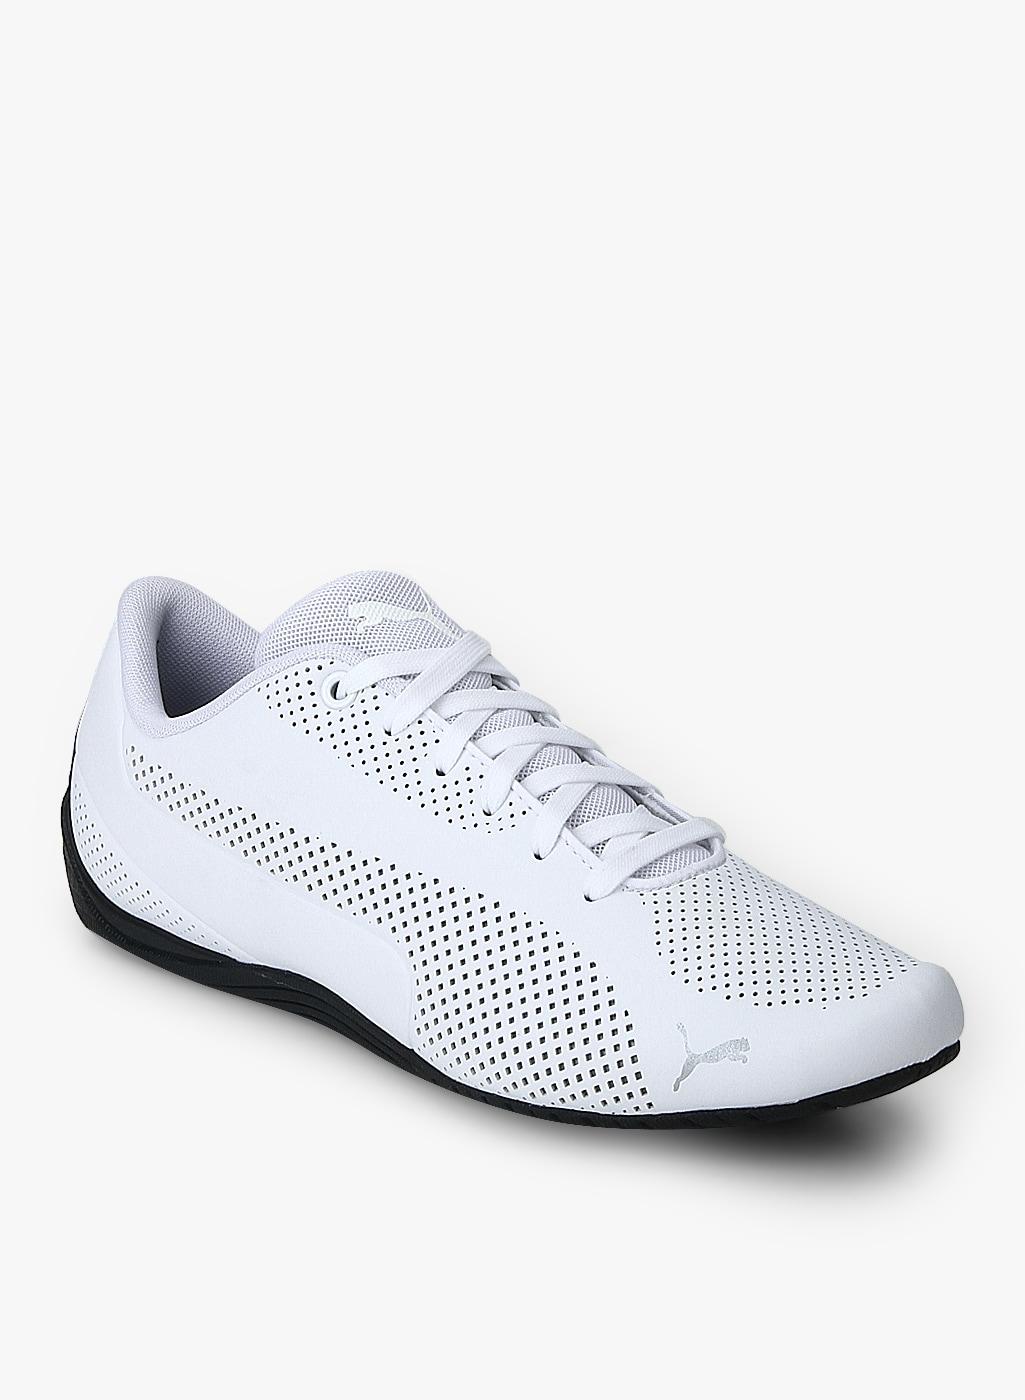 e864fbe9f64 Puma Drift Cat Ultra Reflective White Sneakers for Men online in ...